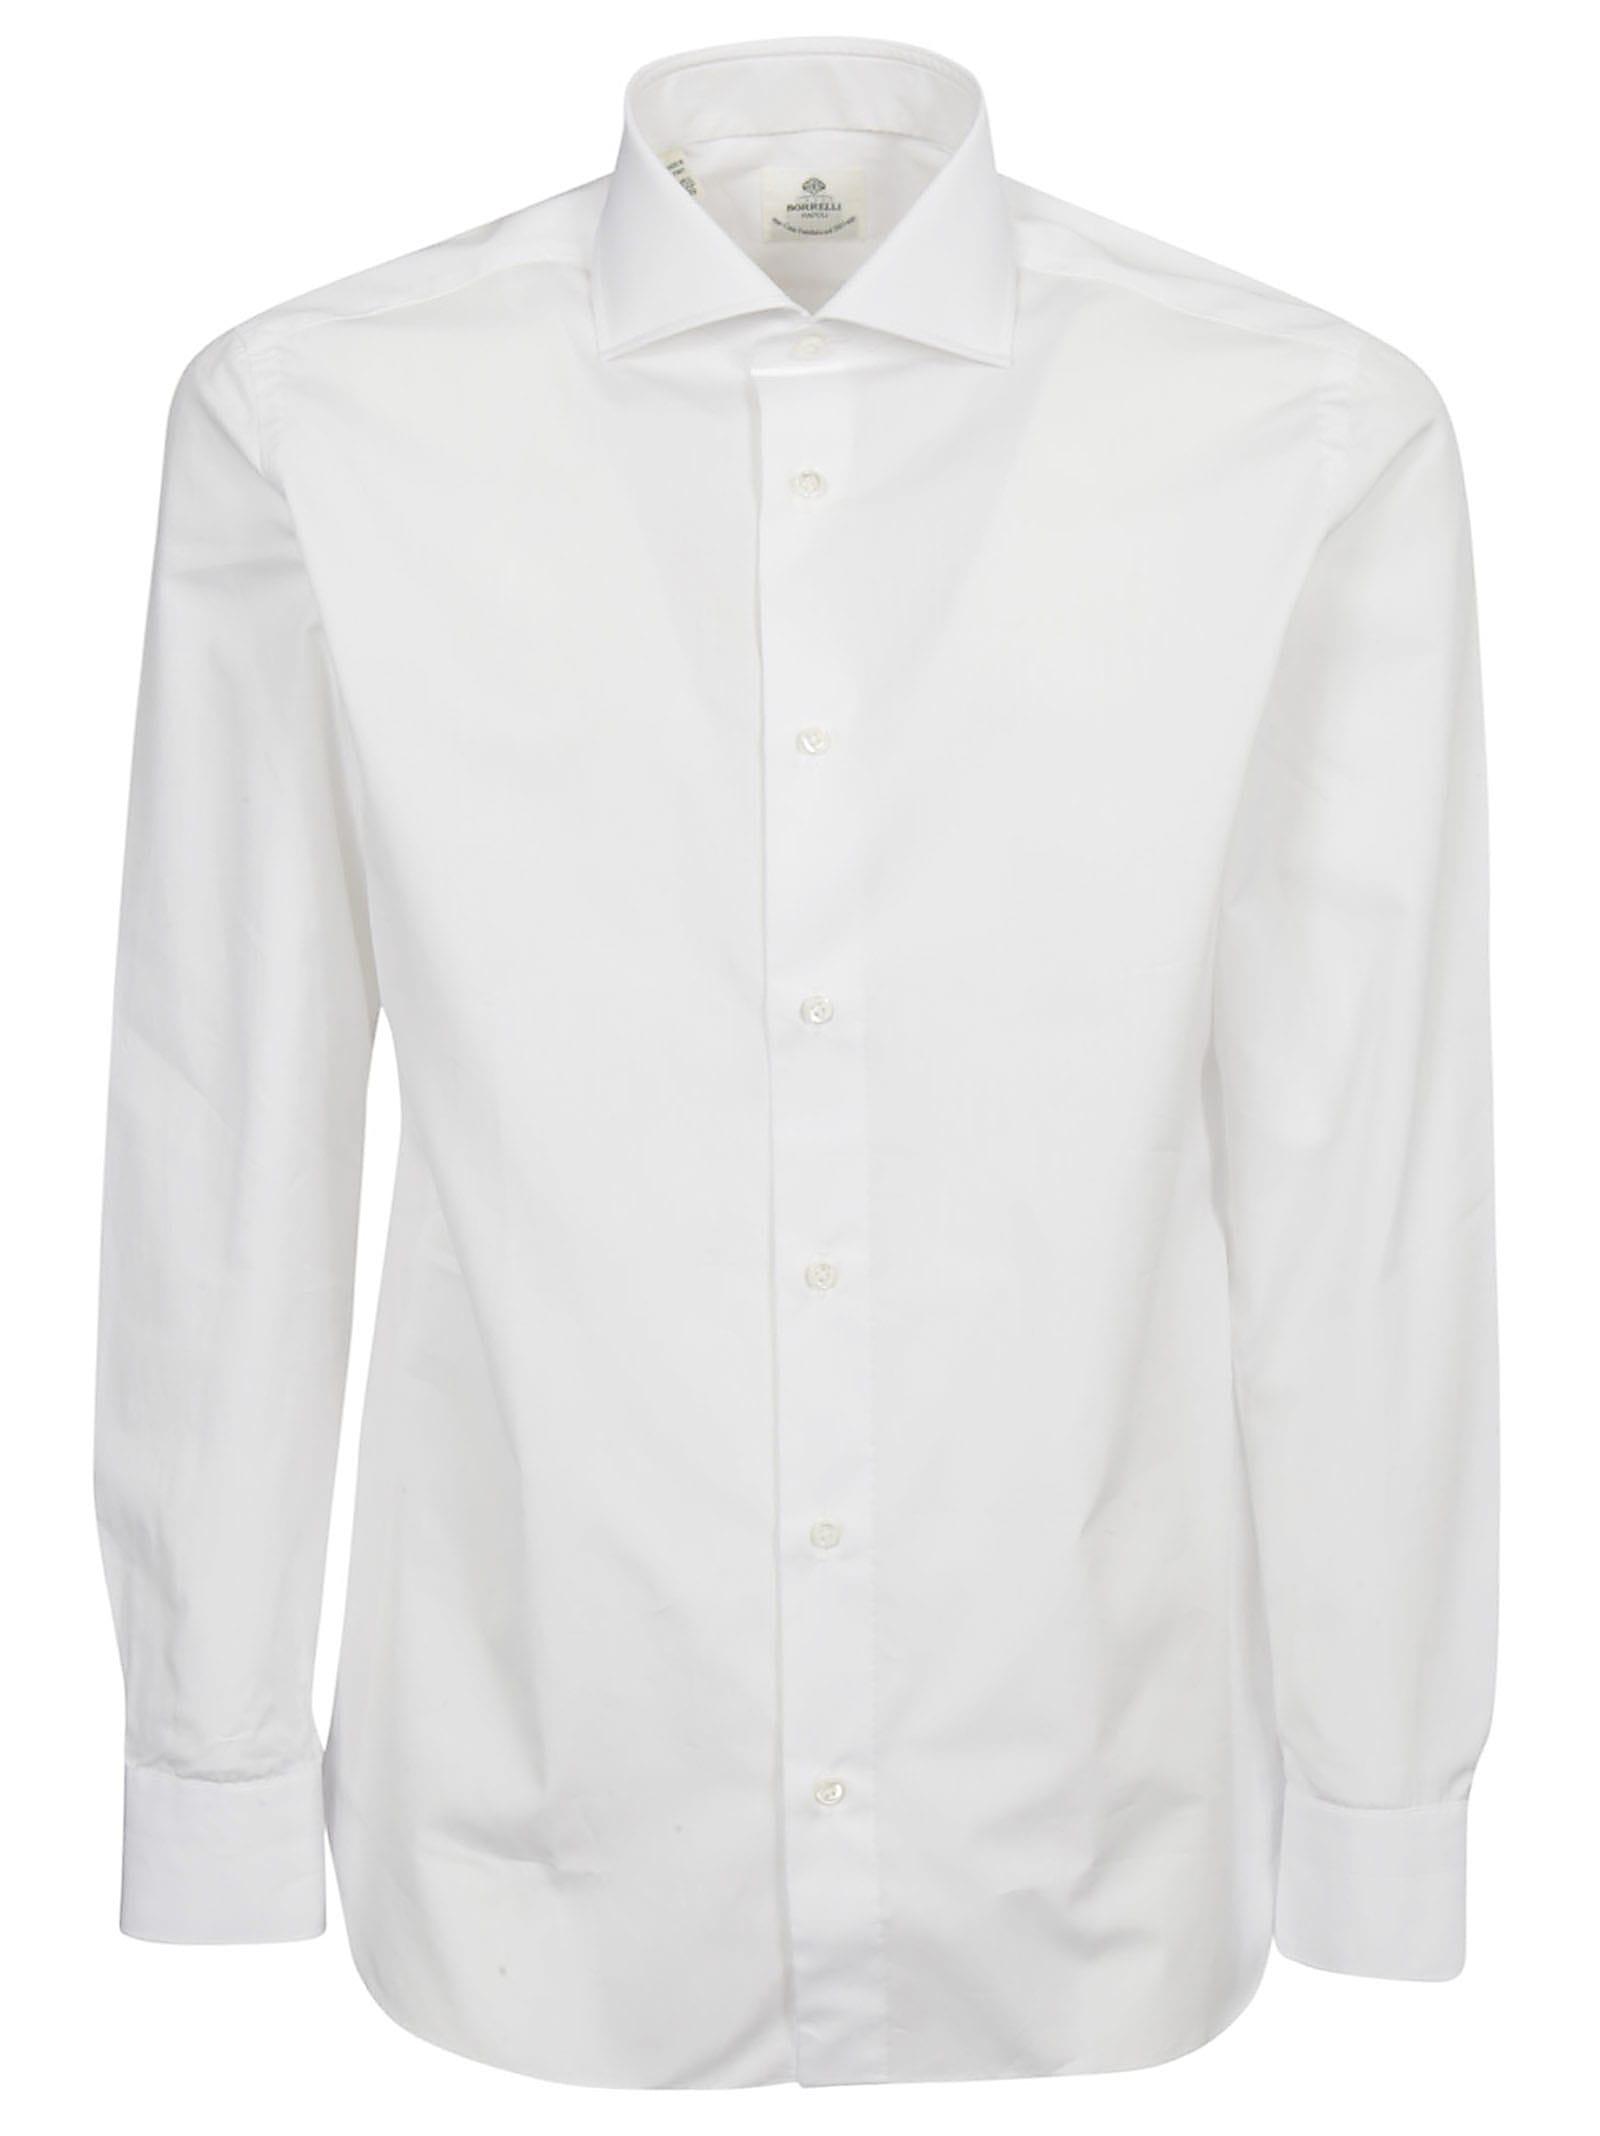 Long-sleeved Shirt